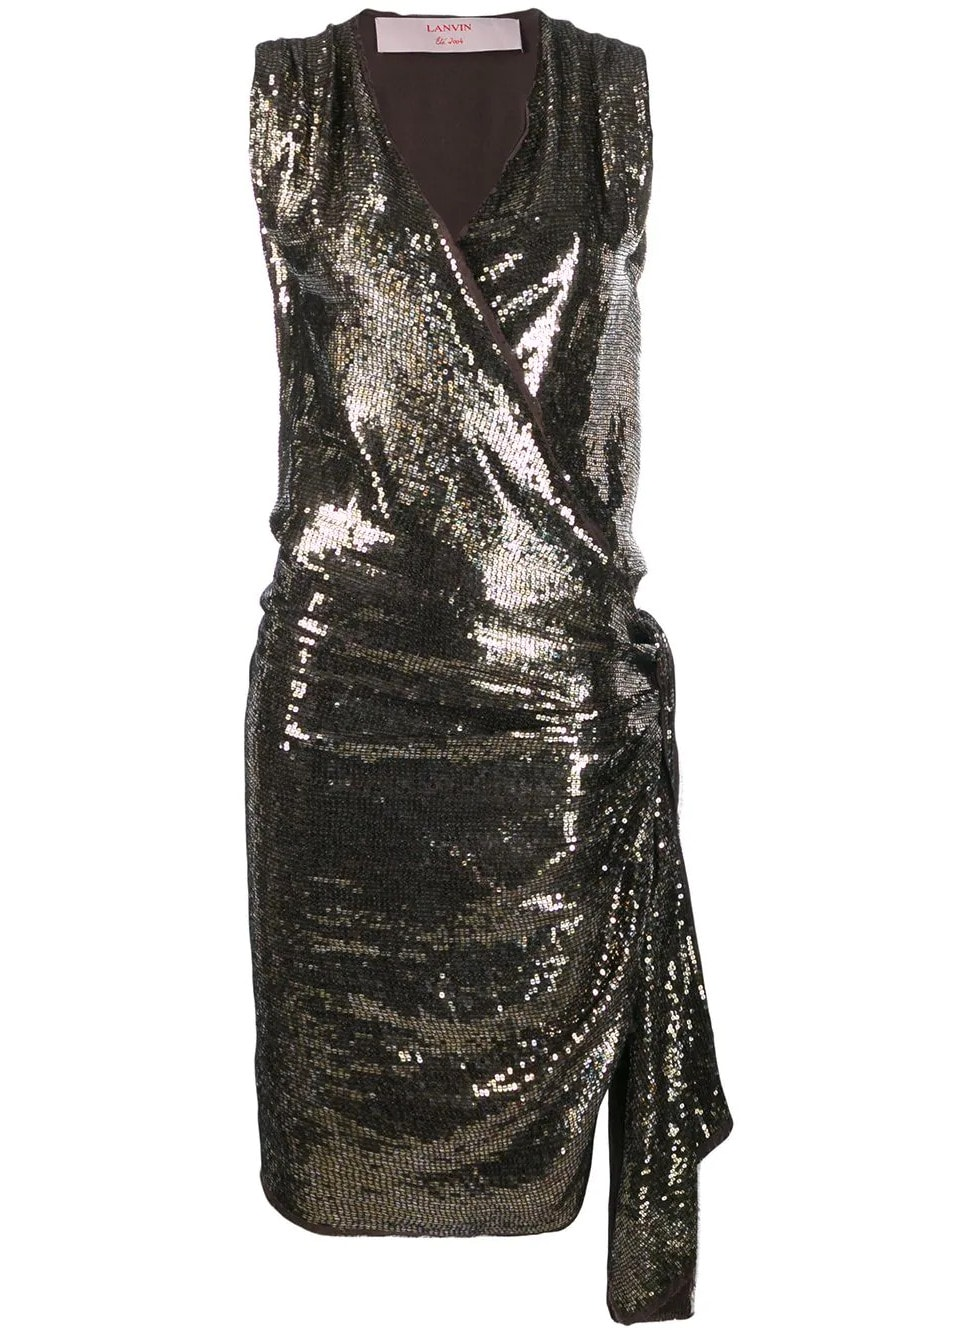 LANVIN Pre-Owned 2004's Sequin Envelope Dress - Farfetch